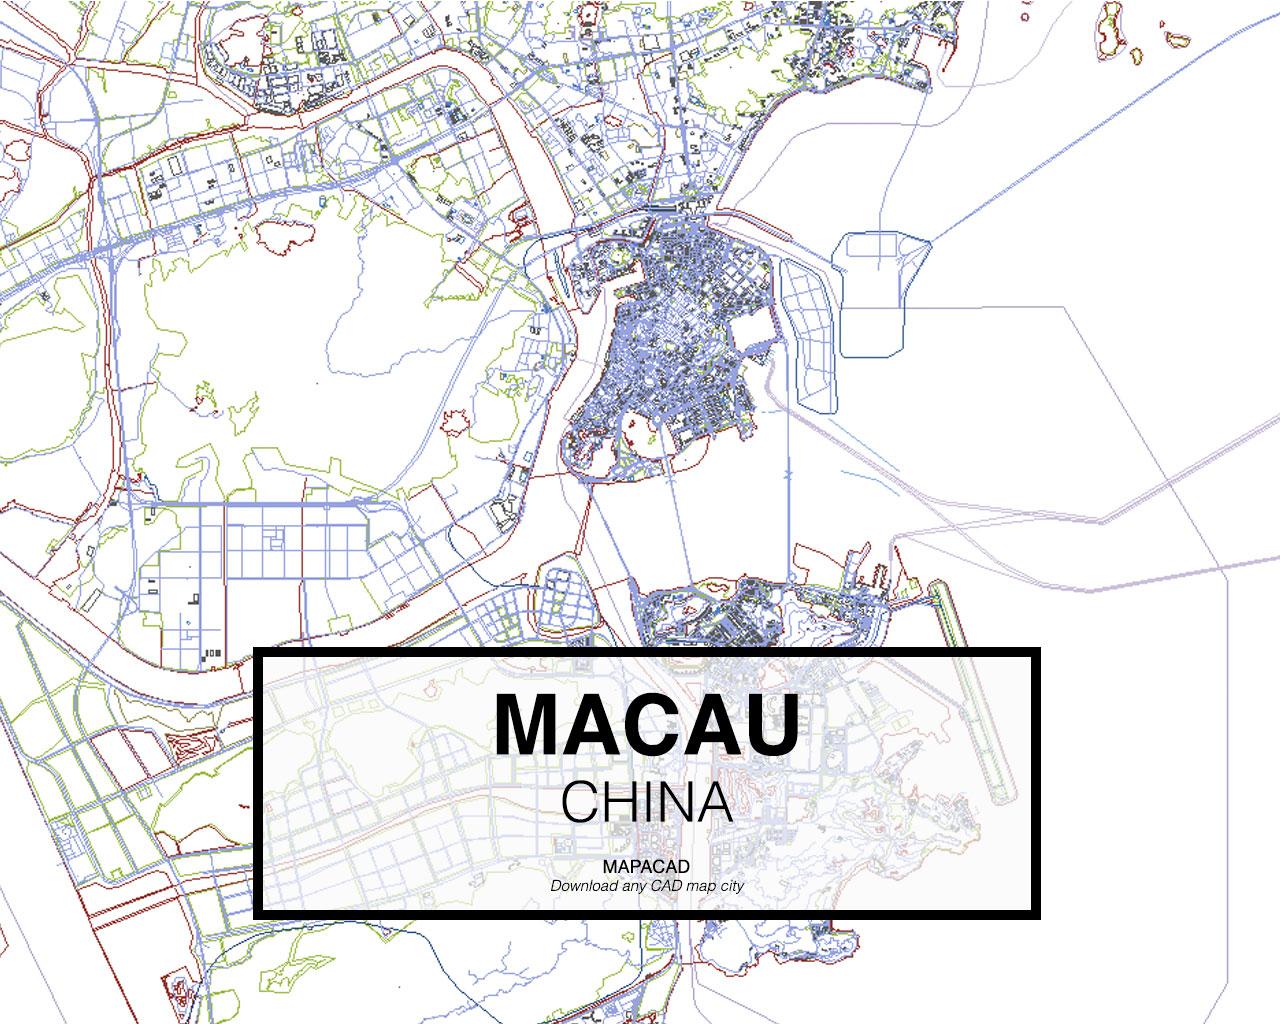 Download macau dwg mapacad macau china 01 mapacad download map cad dwg gumiabroncs Image collections